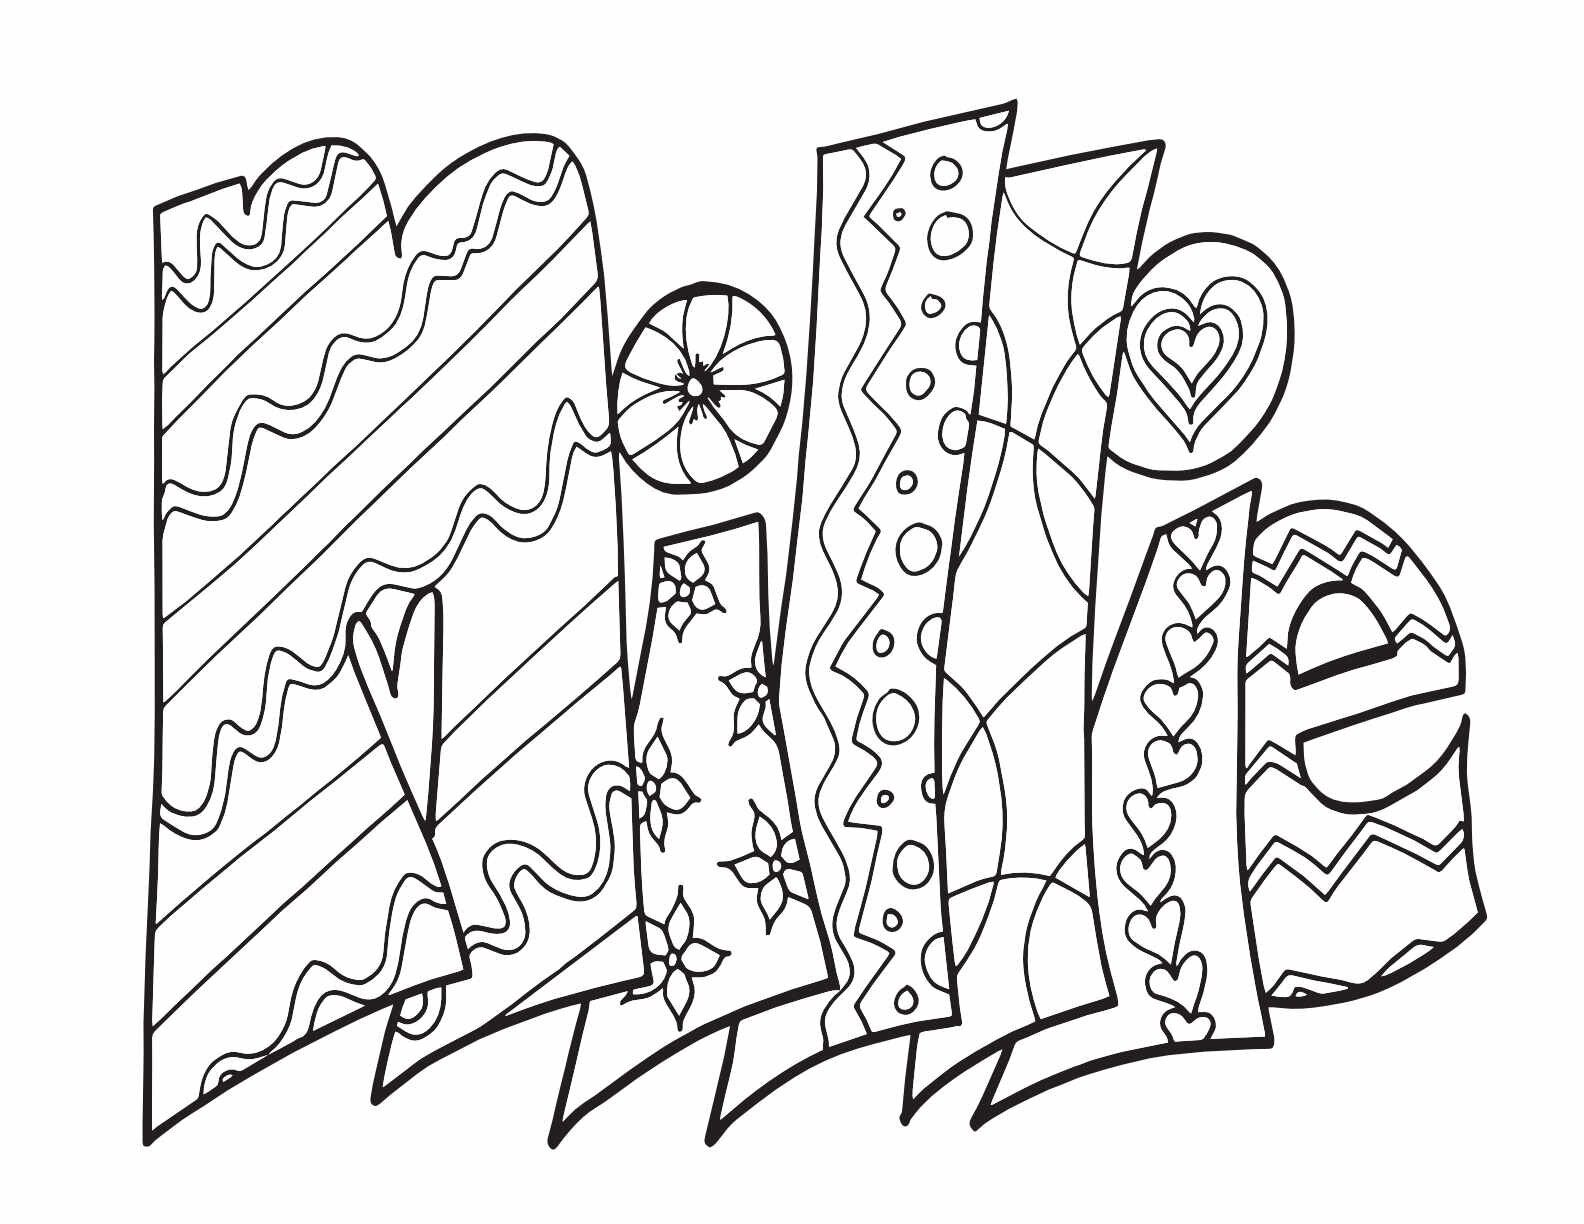 Millie Free Printable Coloring Page Stevie Doodles Free Printable Coloring Free Printable Coloring Pages Coloring Pages